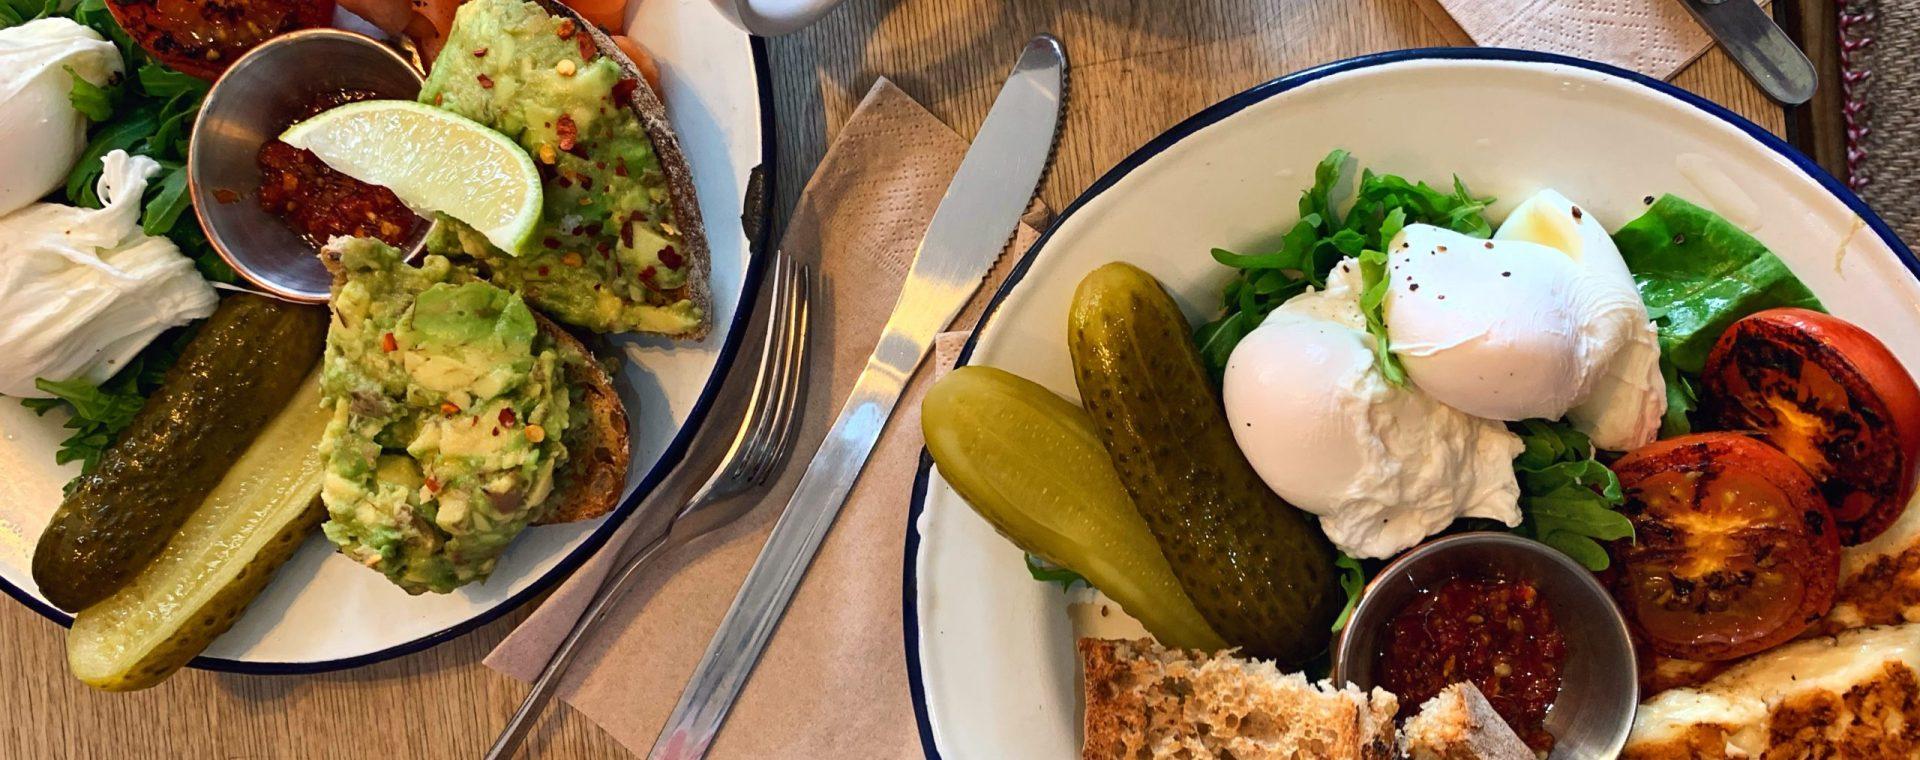 Bournemouth South Coast Roast Cafe Breakfast